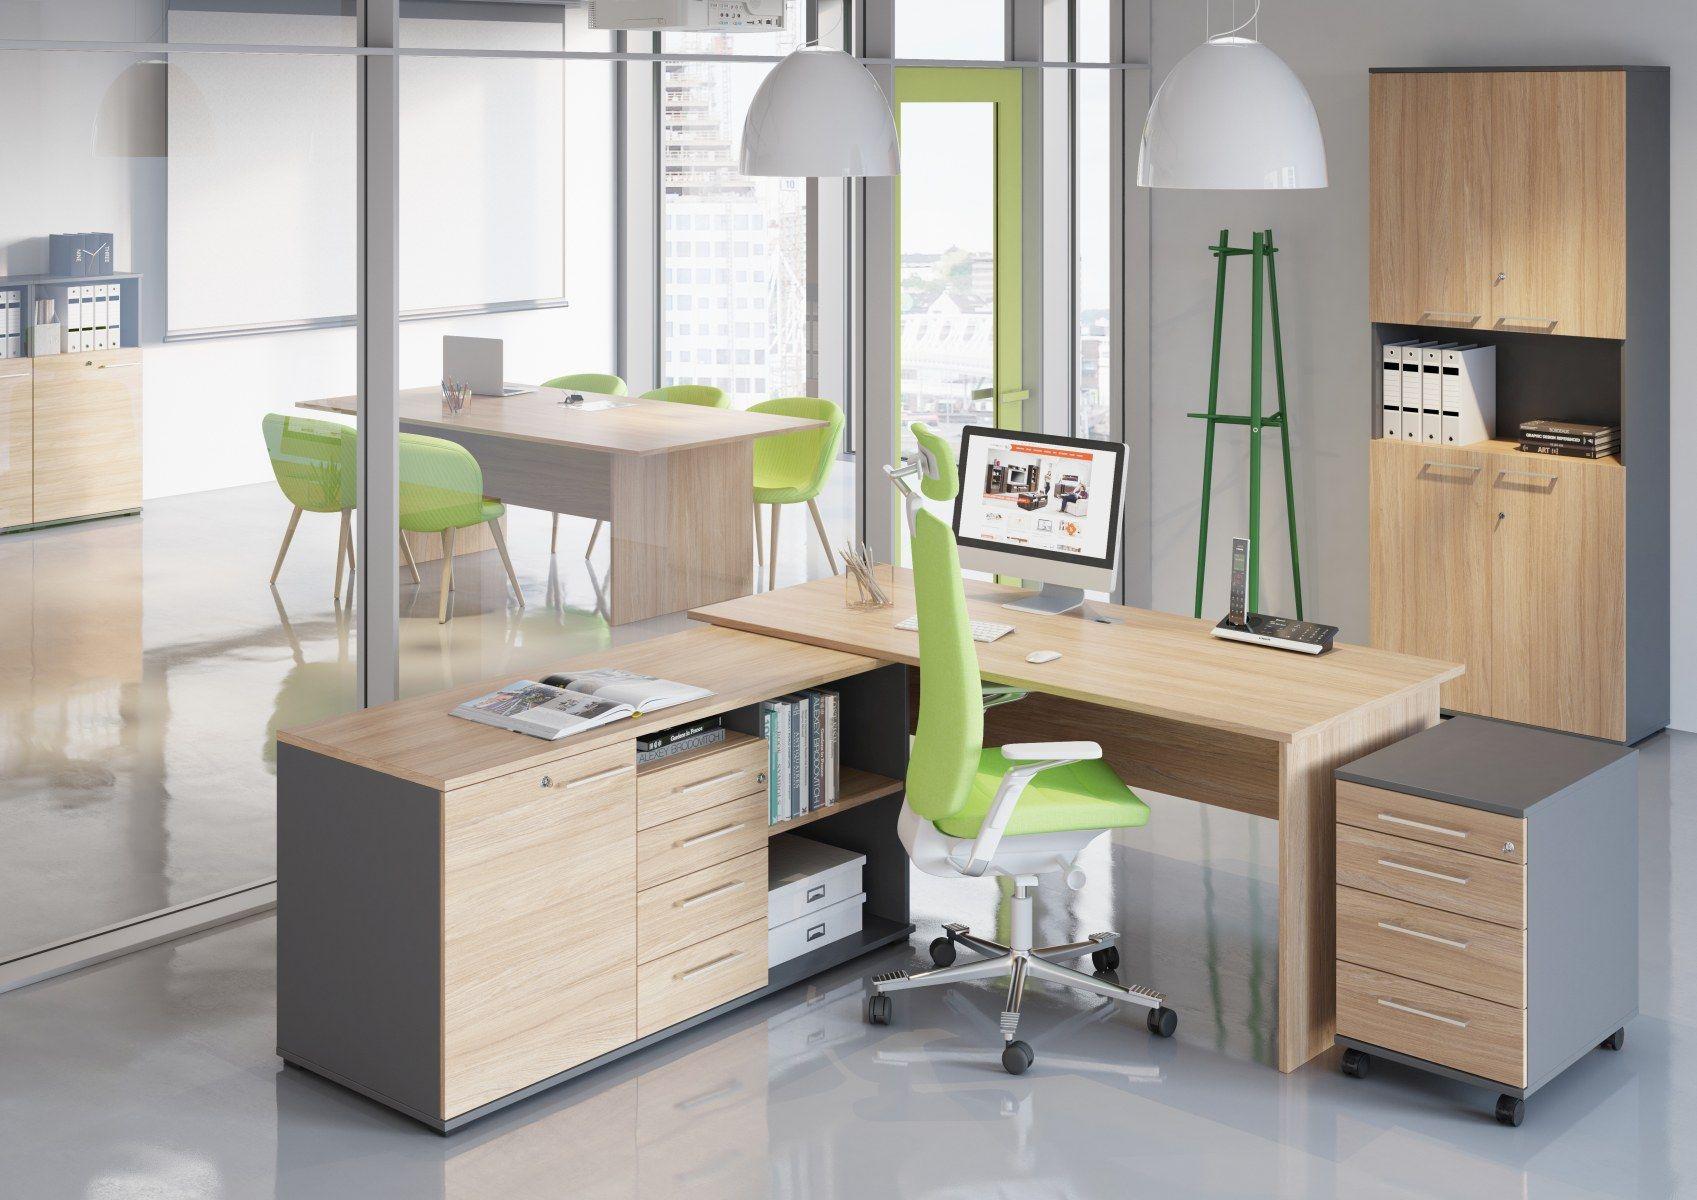 omega biuro jednoosobowe sala konferencyjna